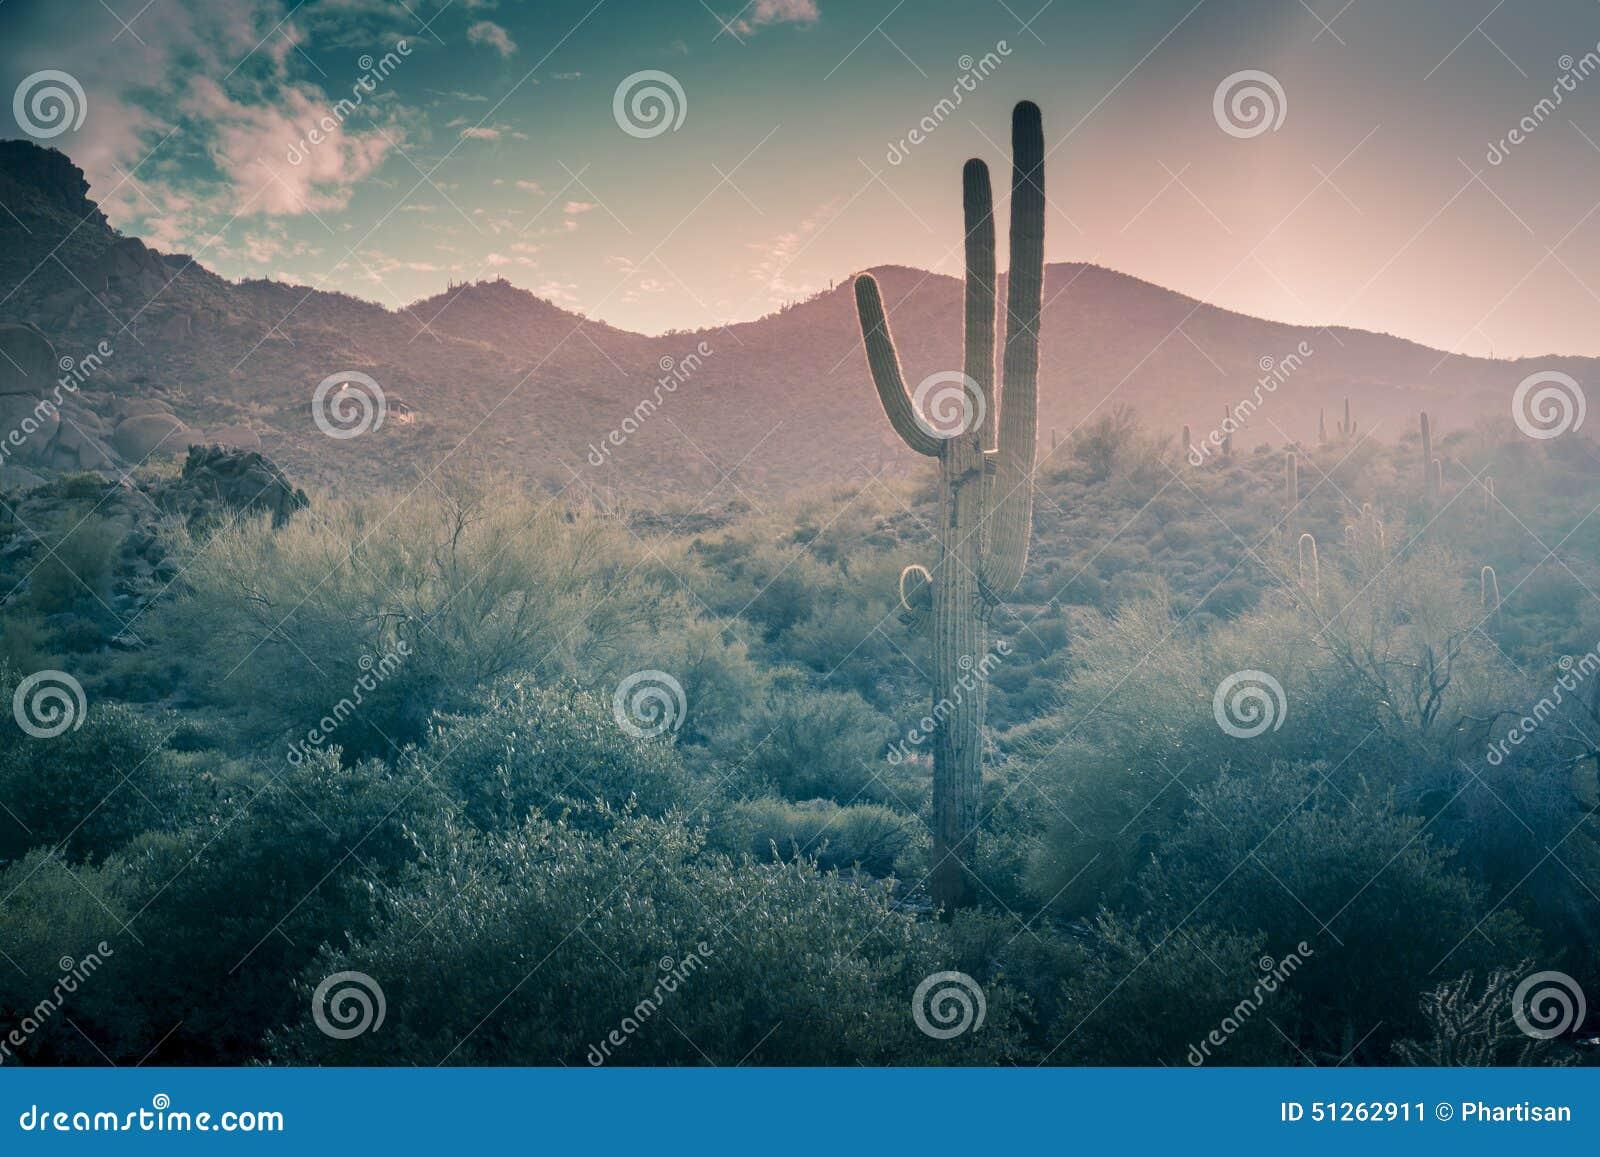 Desert landscape rain Phoenix, Arizona,USA